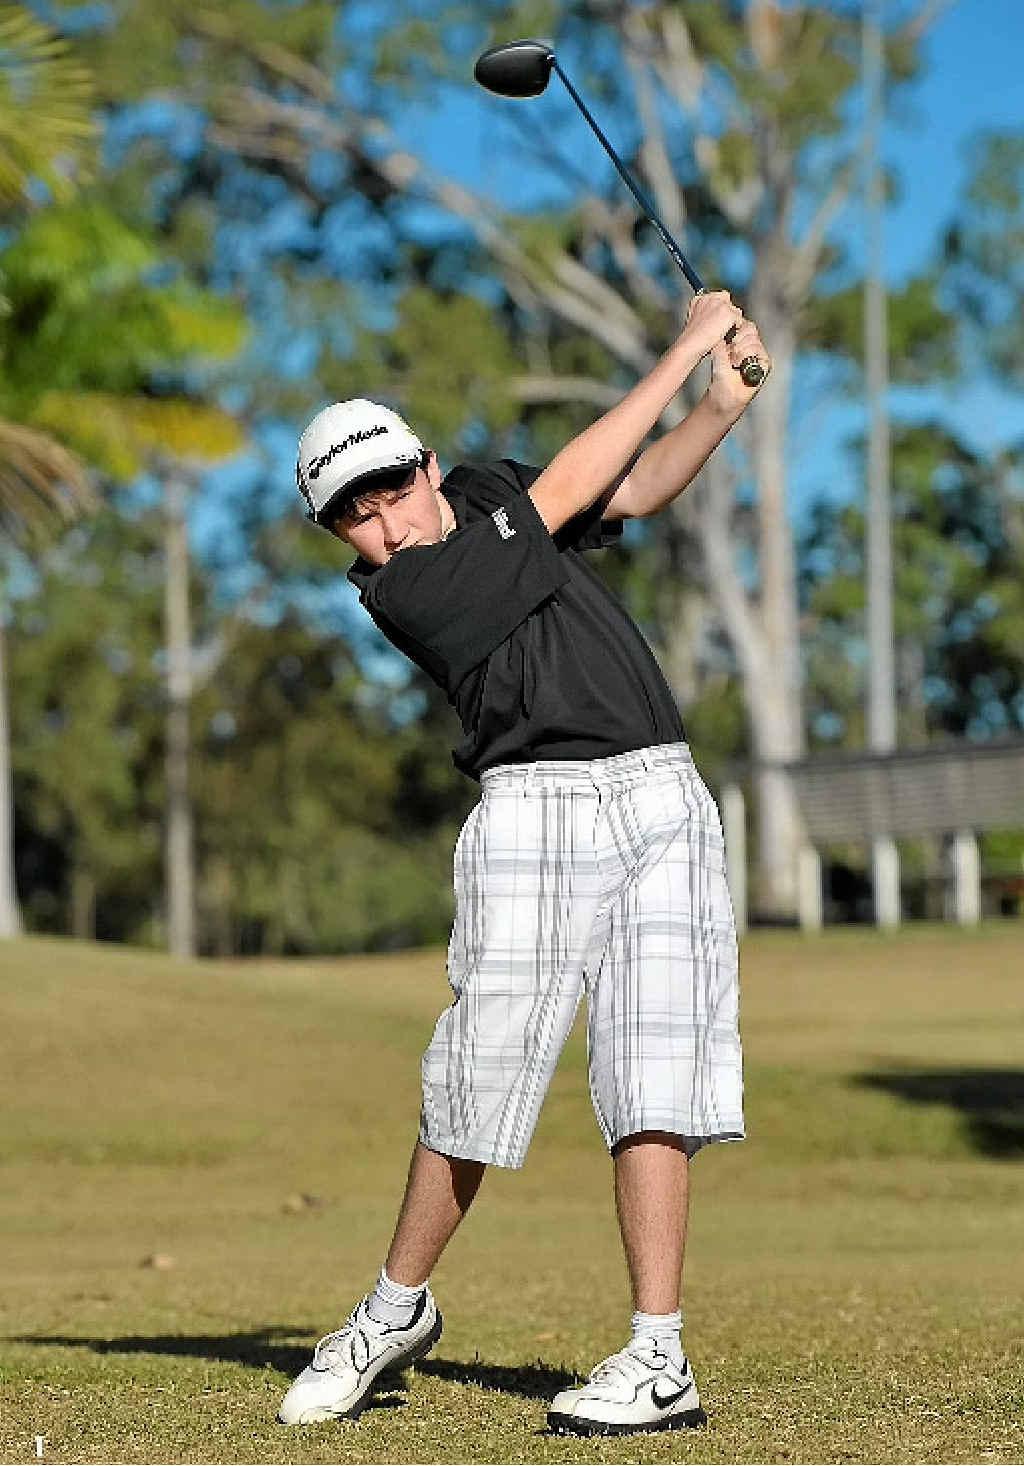 Harry Shuttleworth, 13, has had a stellar year on the CQ golf circuit.